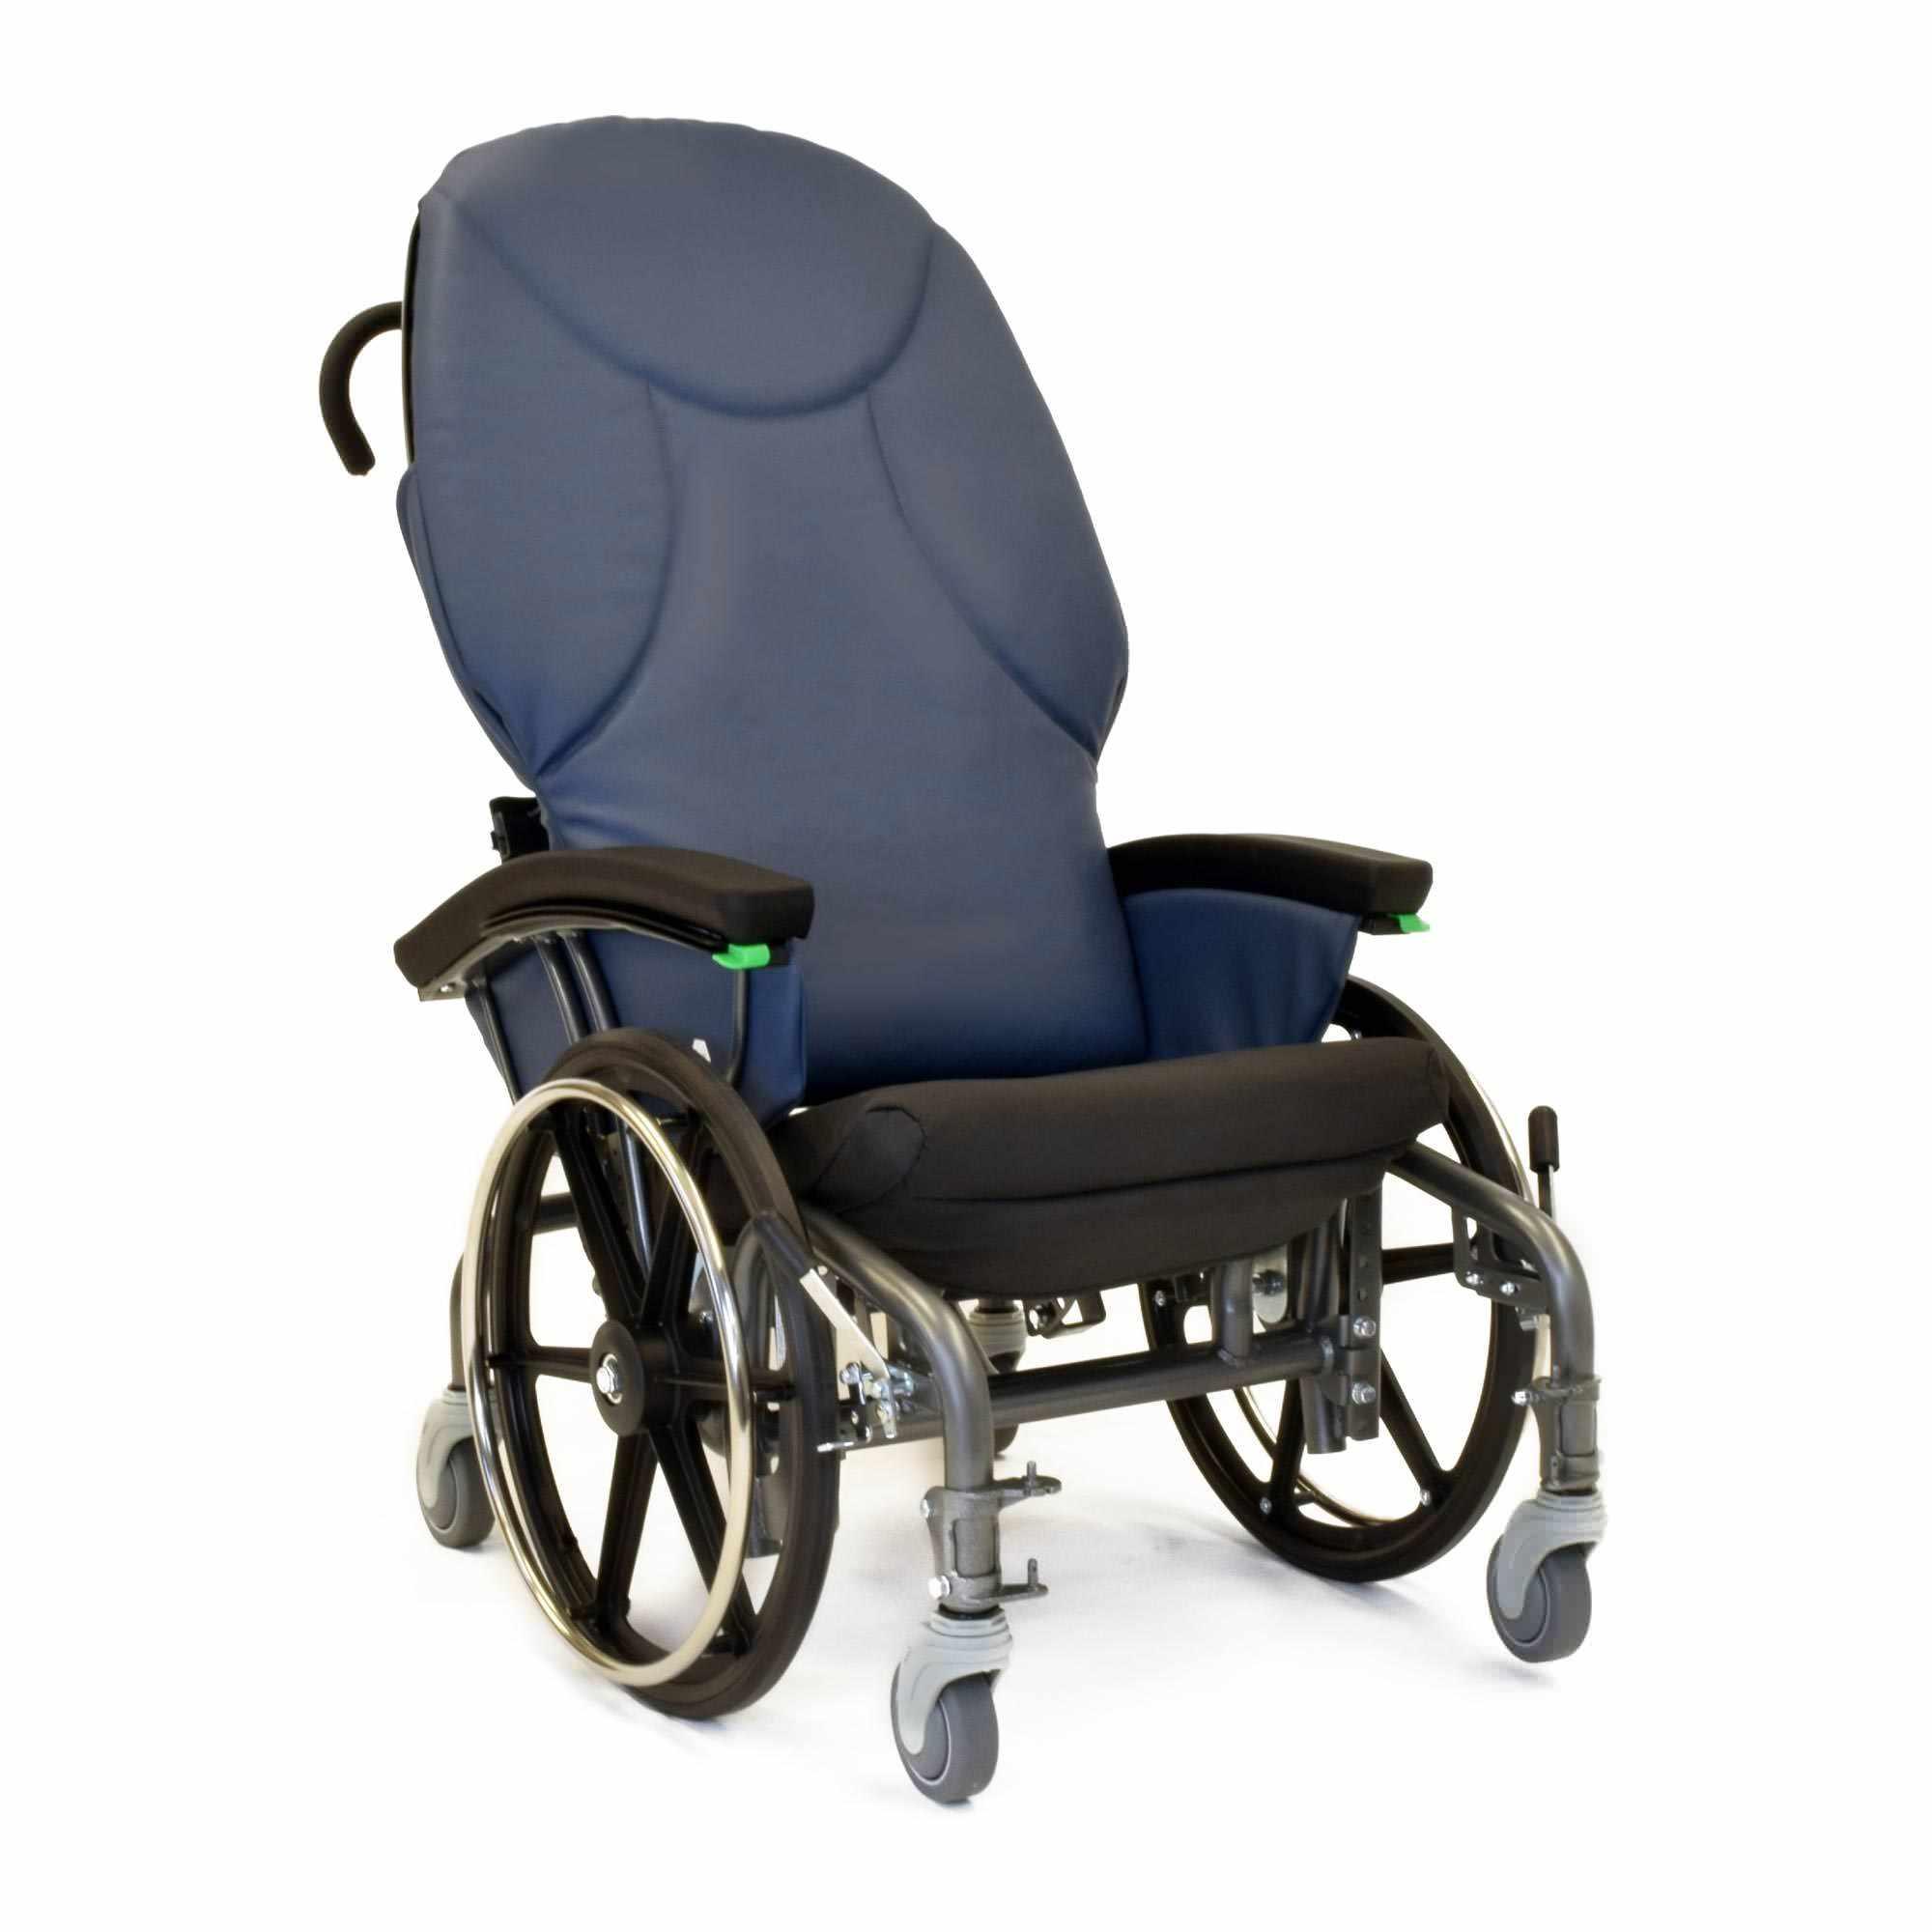 Optima Evolution Mobility Chair